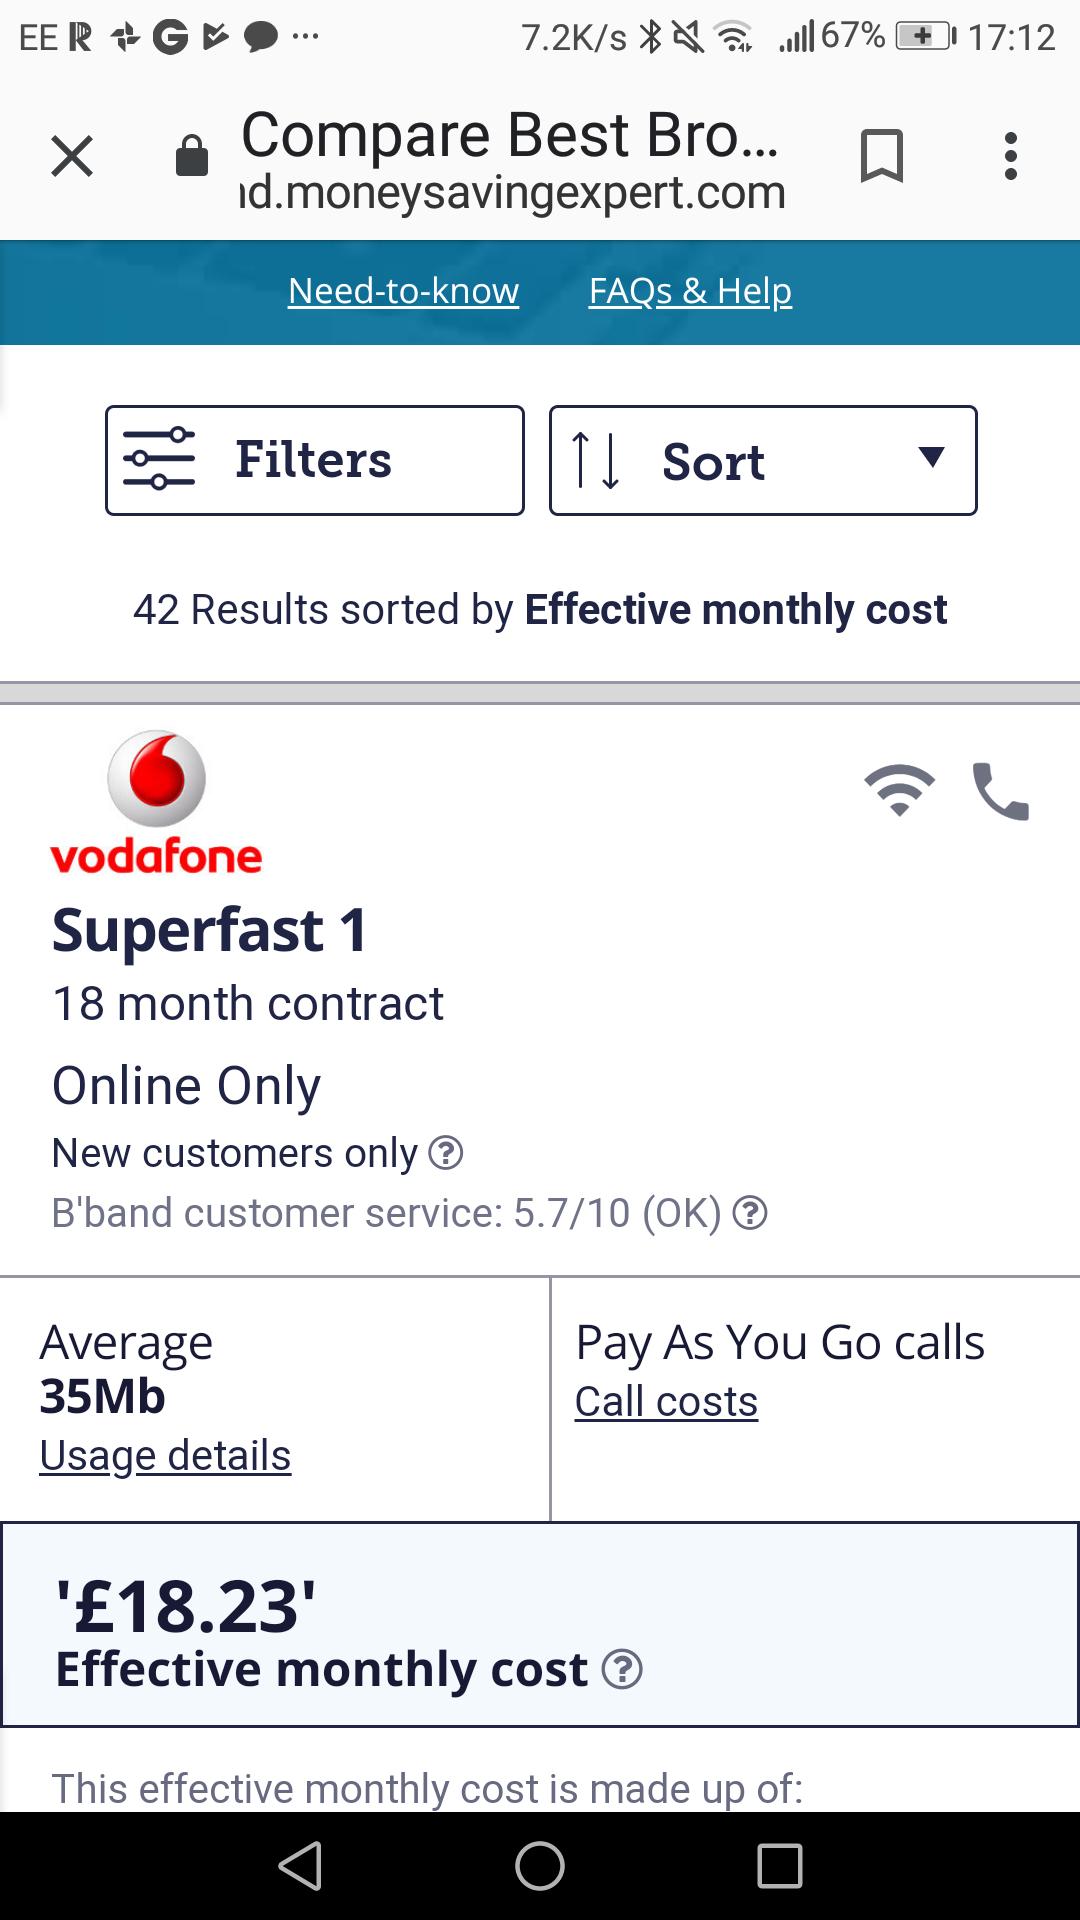 Superfast Vodaphone broadband.35mb. £21 p/m 18 months - £378 - Via moneysavingexpert